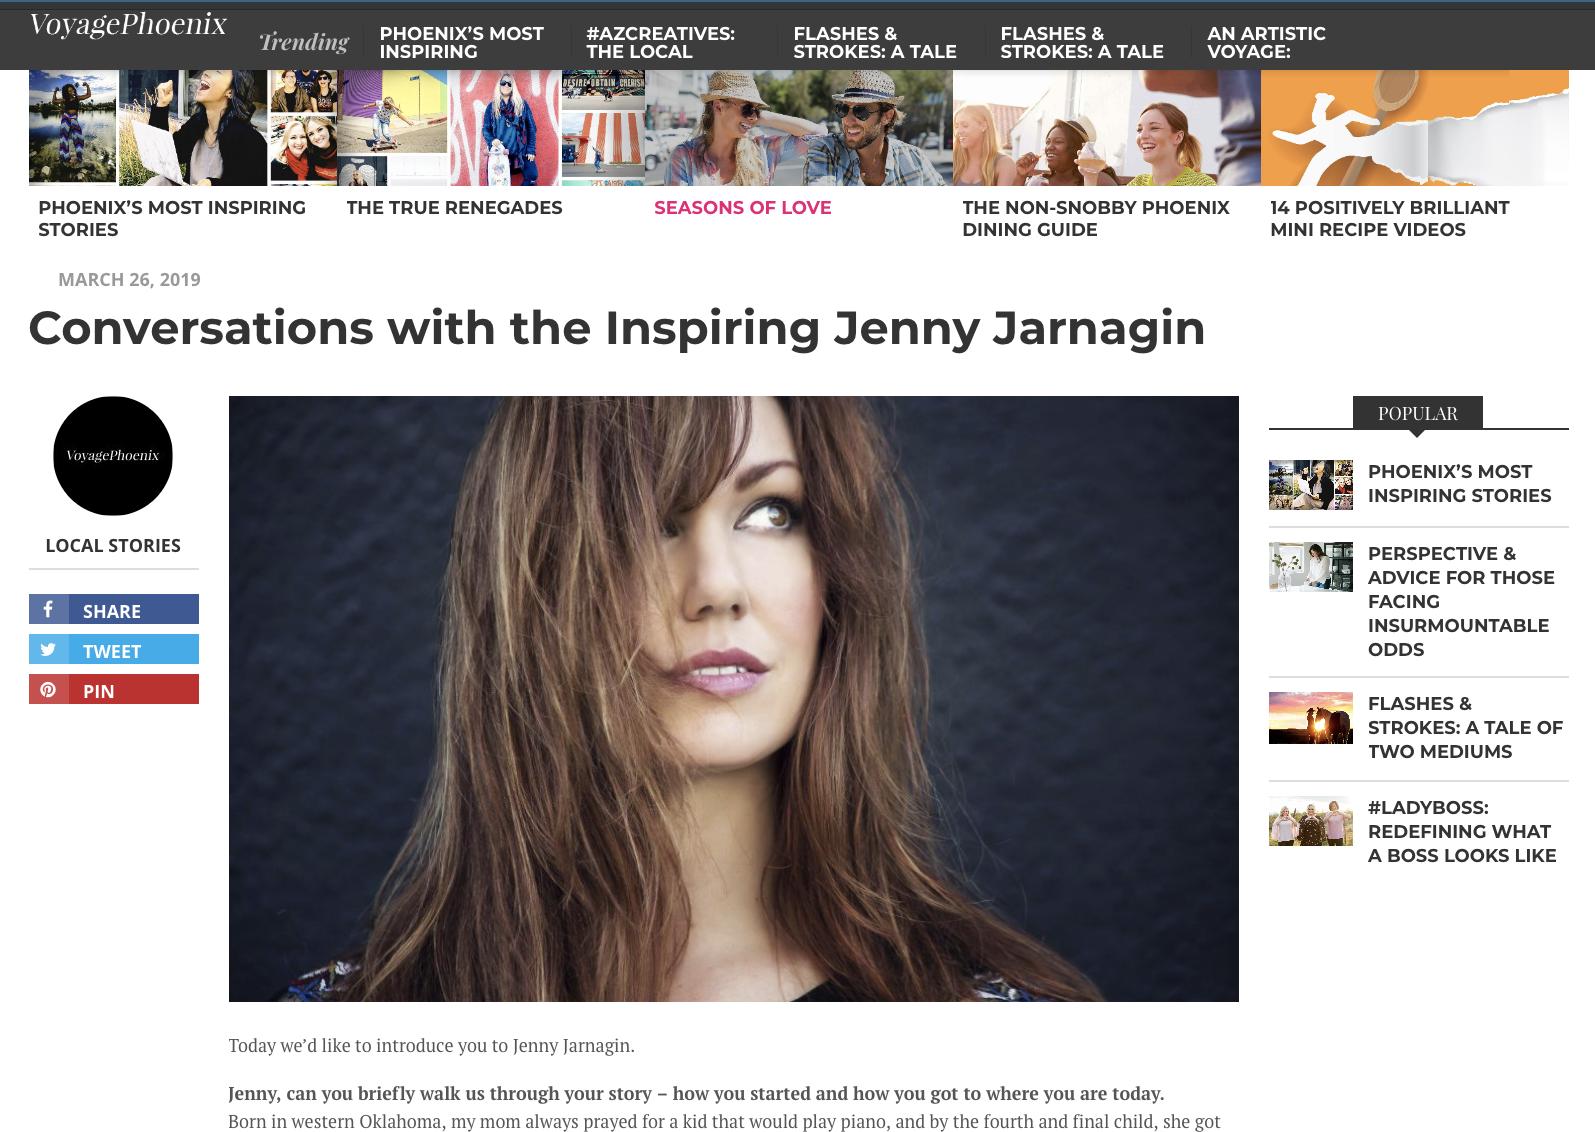 Voyage phoenix - Conversations with the Inspiring Jenny Jarnagin